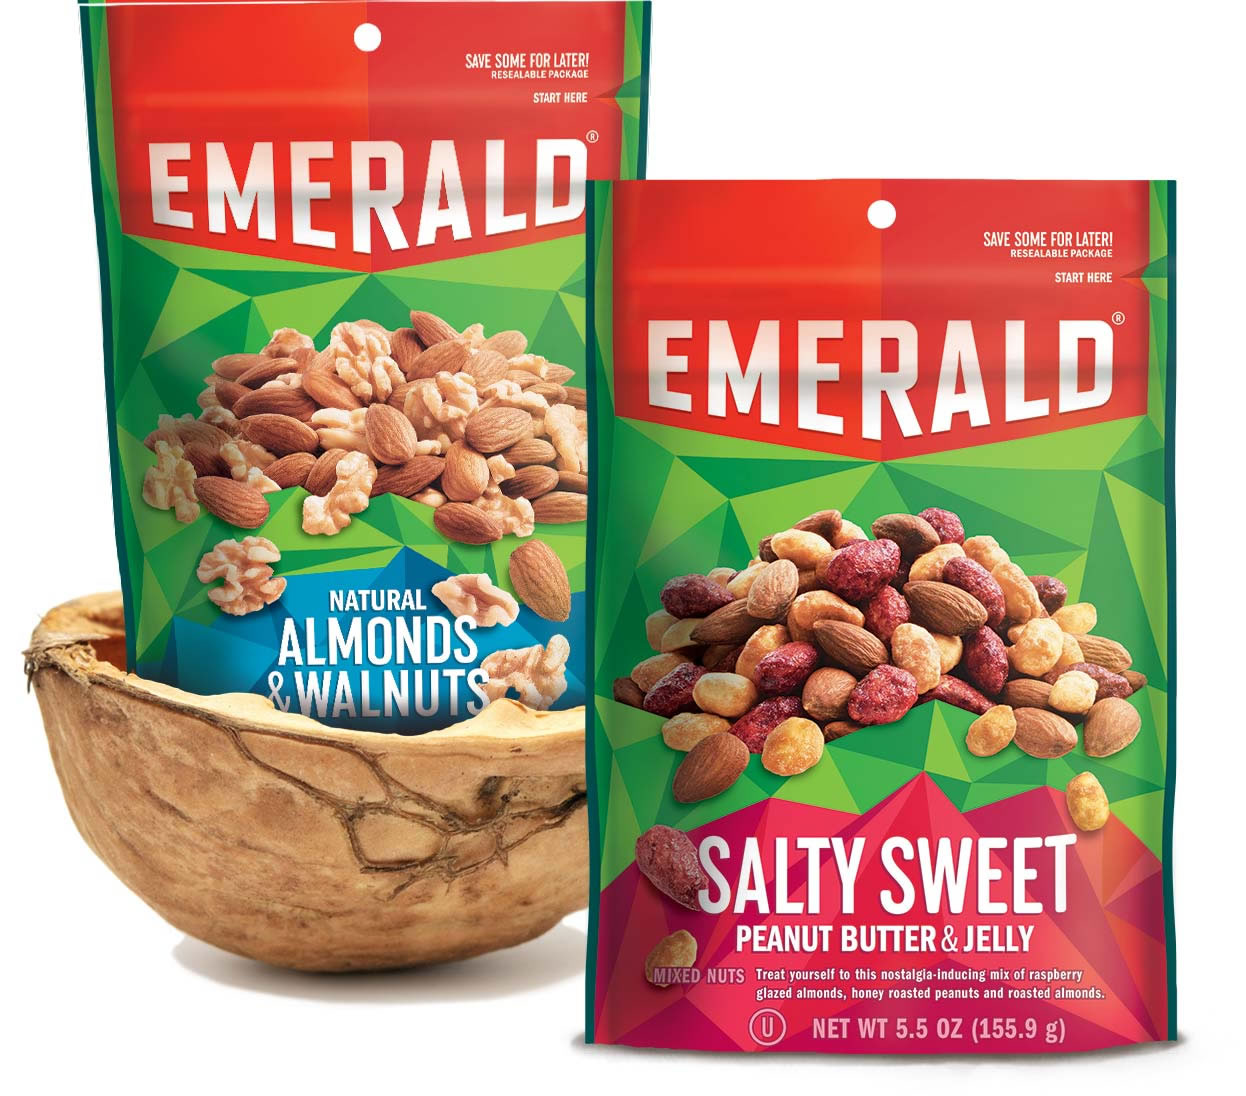 Emerald Packaging